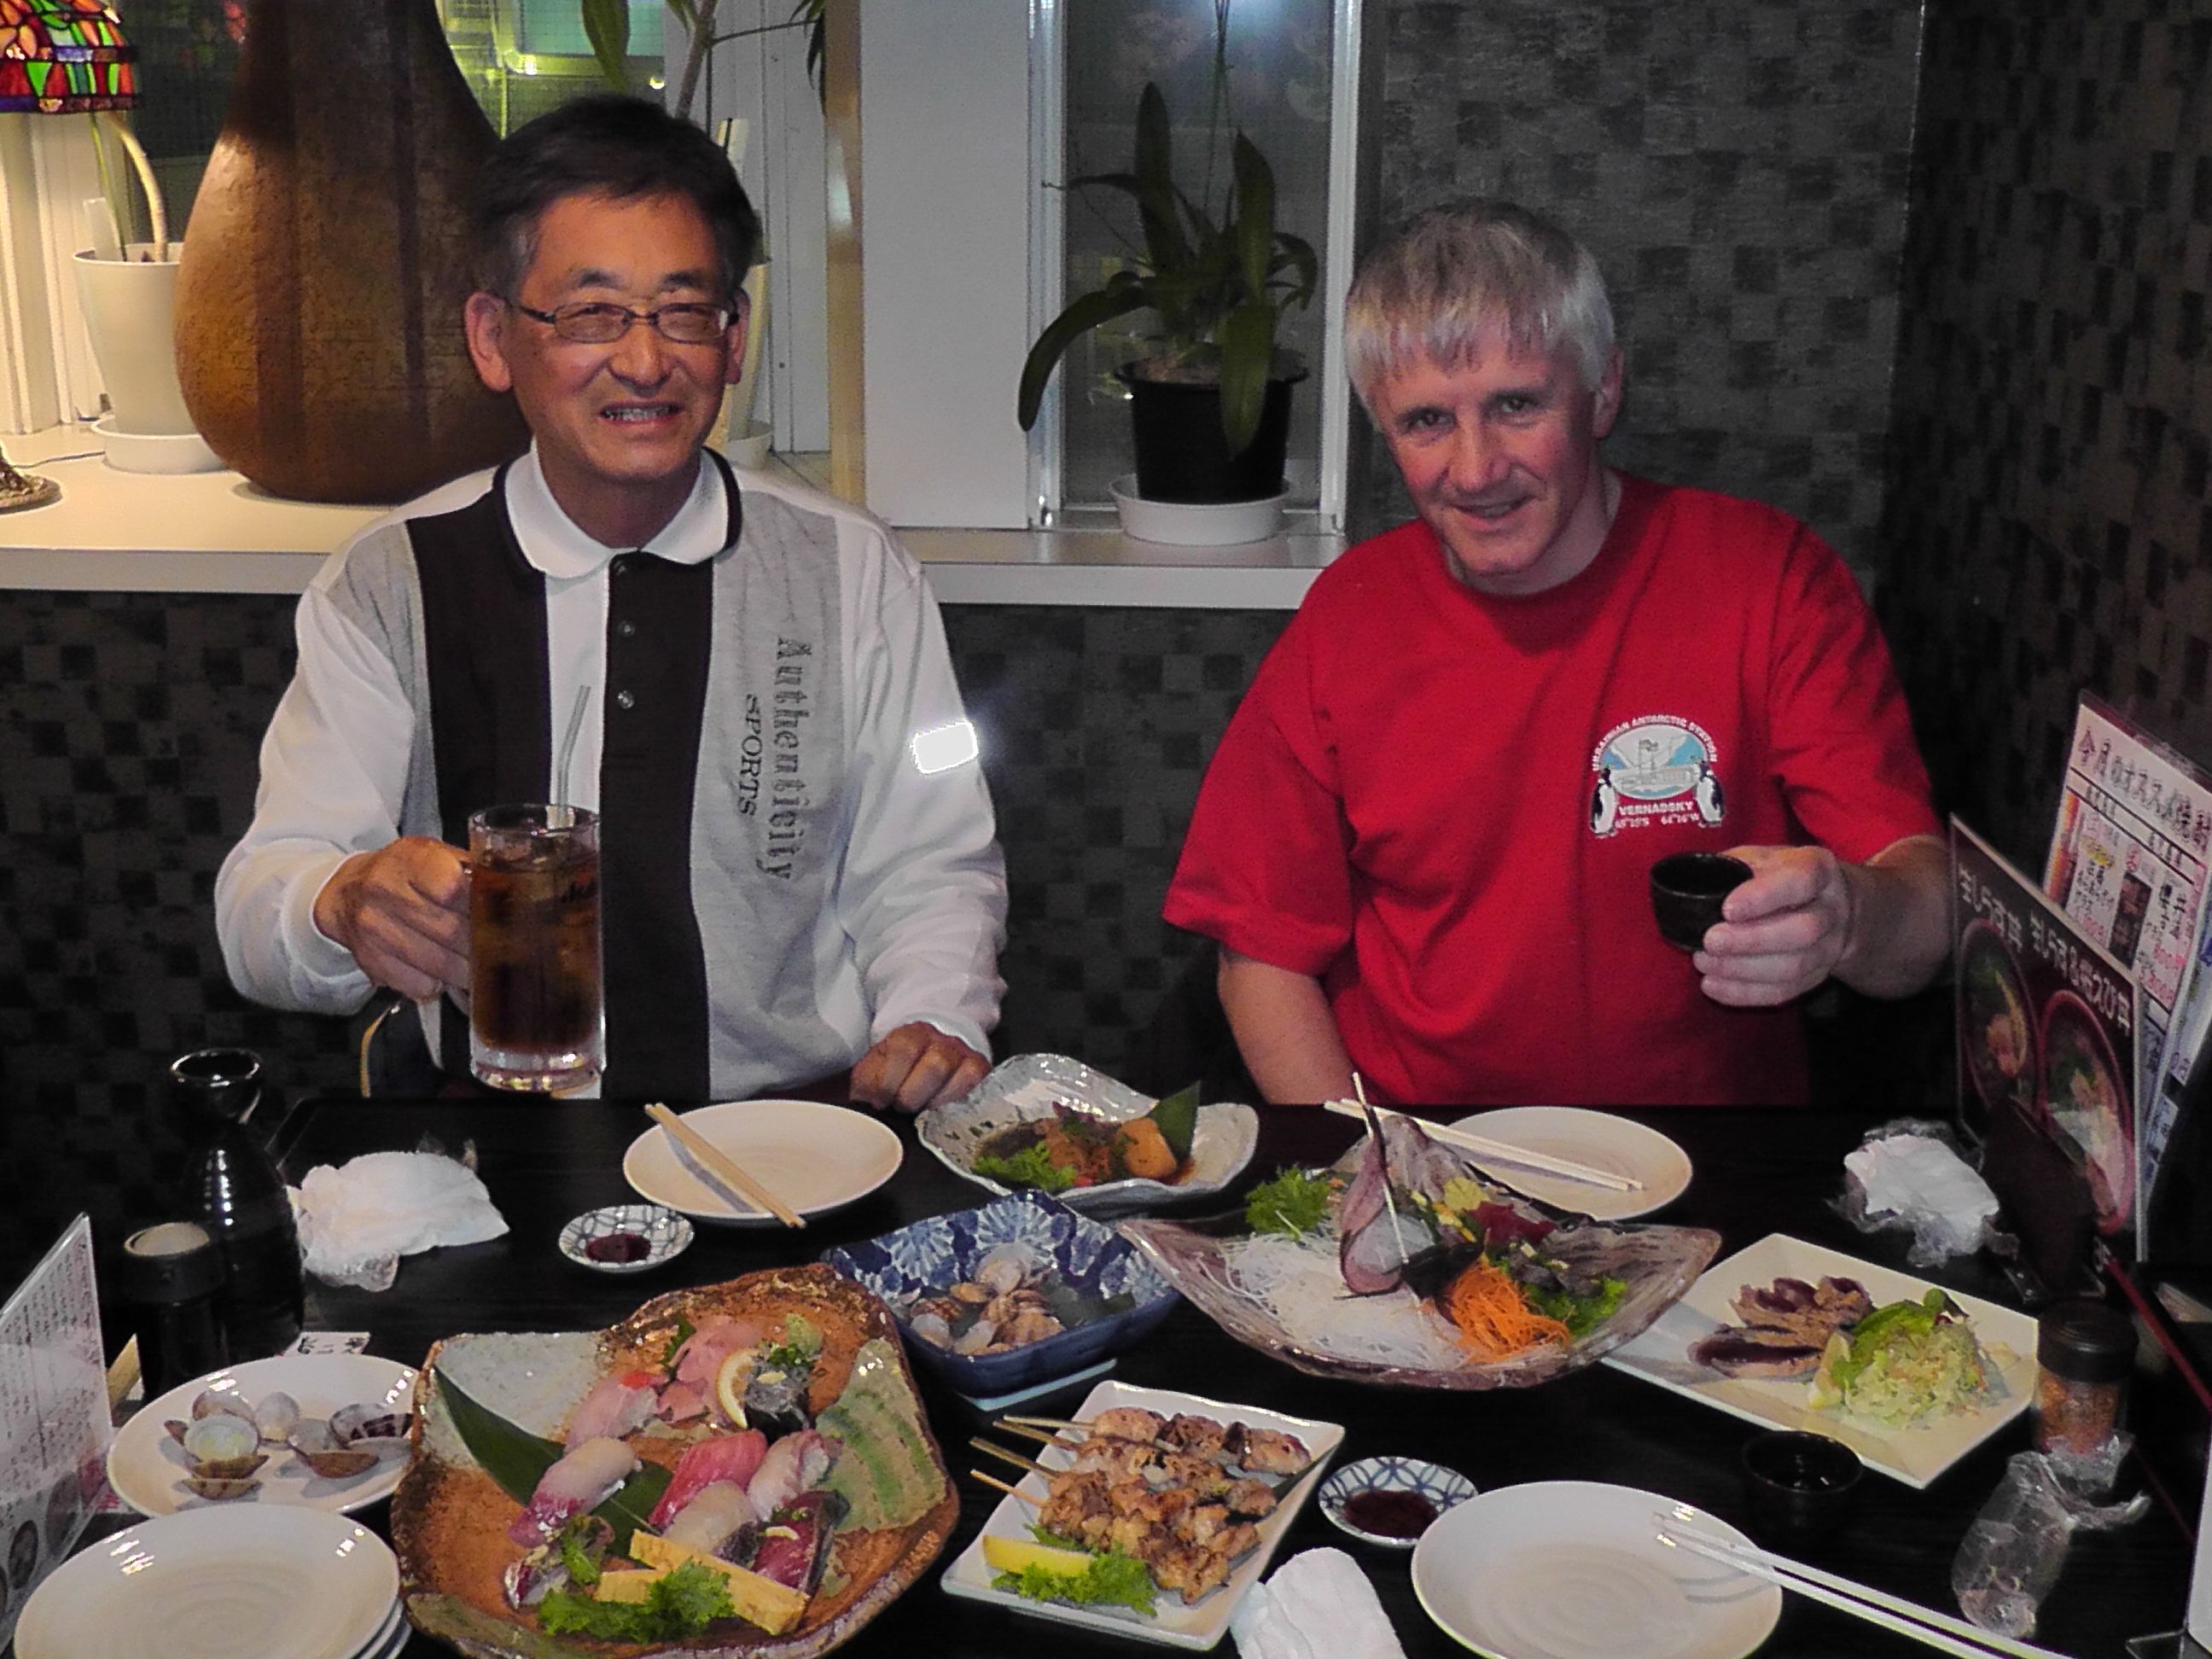 Нажмите на изображение для увеличения.  Название:Japan_2014_Roman_UT7UA_Takashi_Ajiro_JA2JPA_dinner.JPG Просмотров:114 Размер:2.05 Мб ID:119190